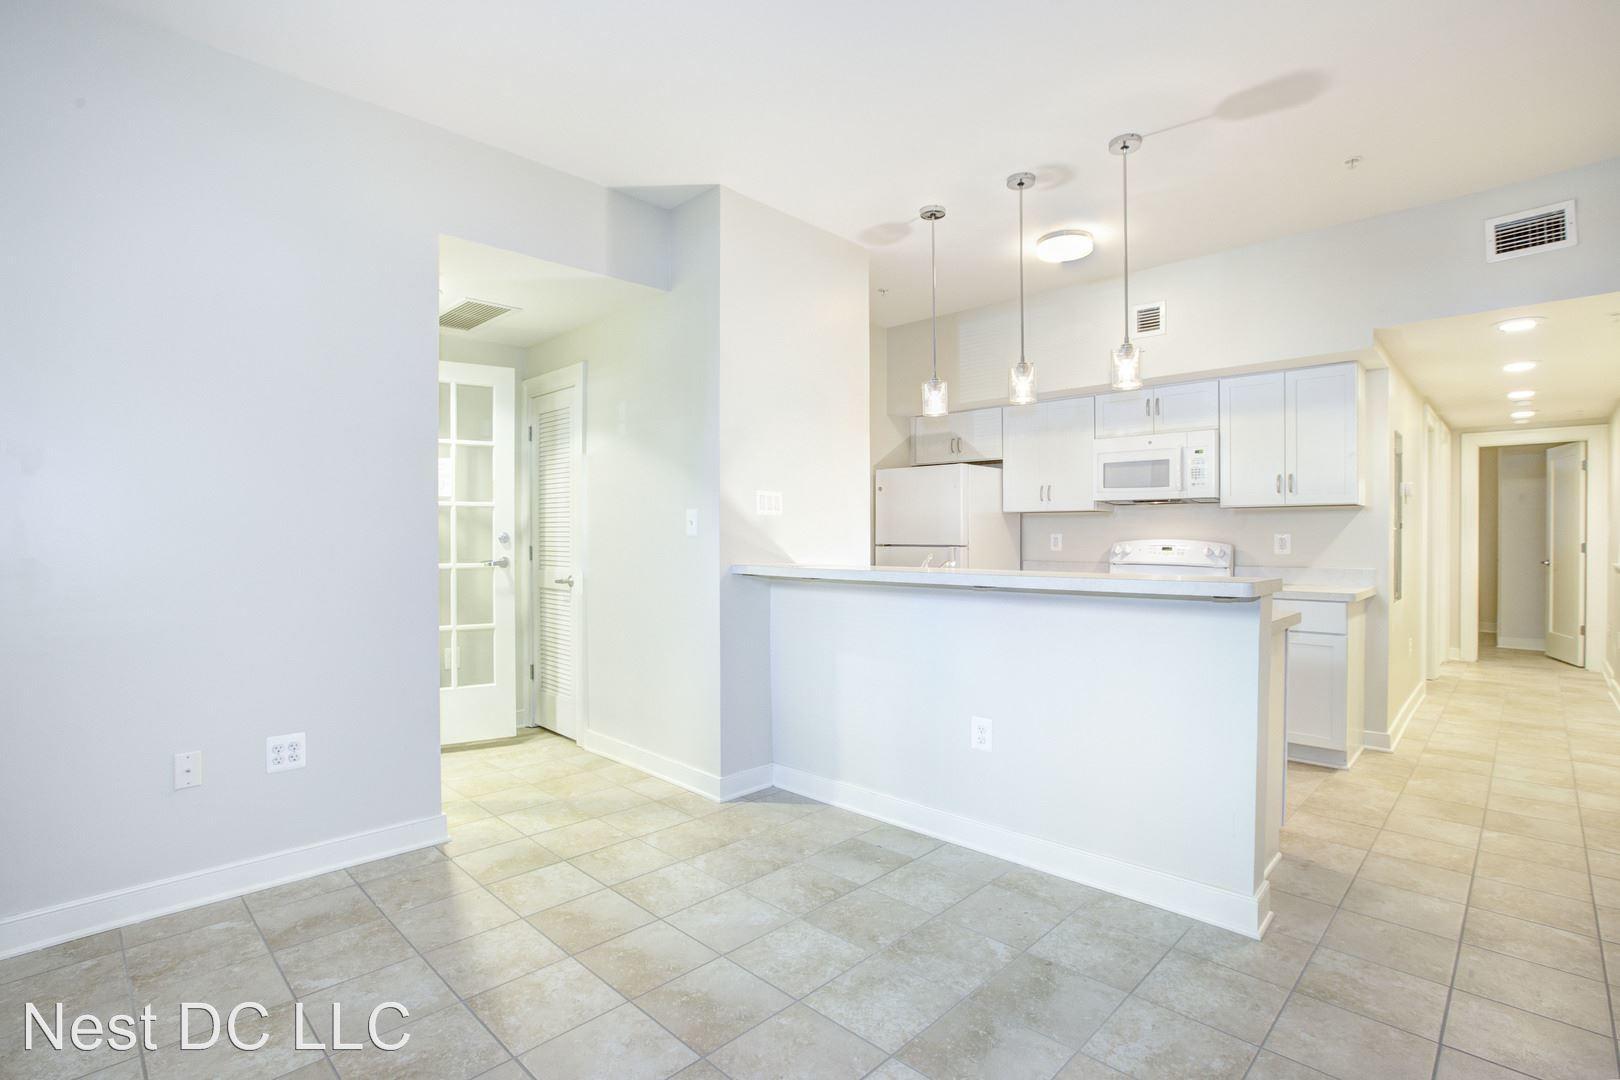 2150 F St NW #B For Rent - Washington, DC | Trulia